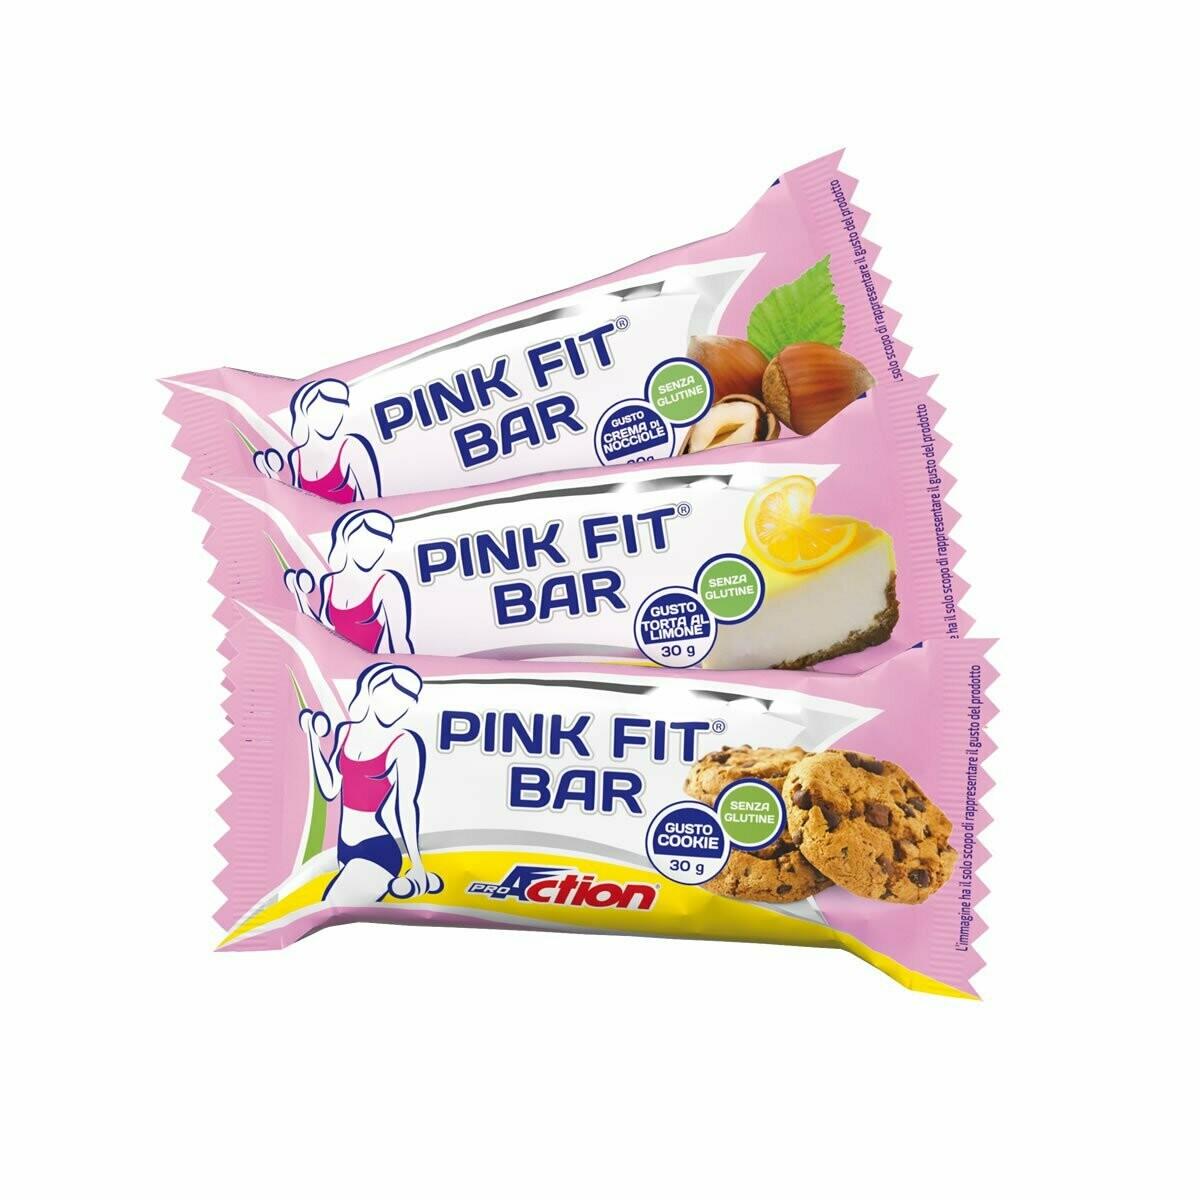 Pink Fit Bar